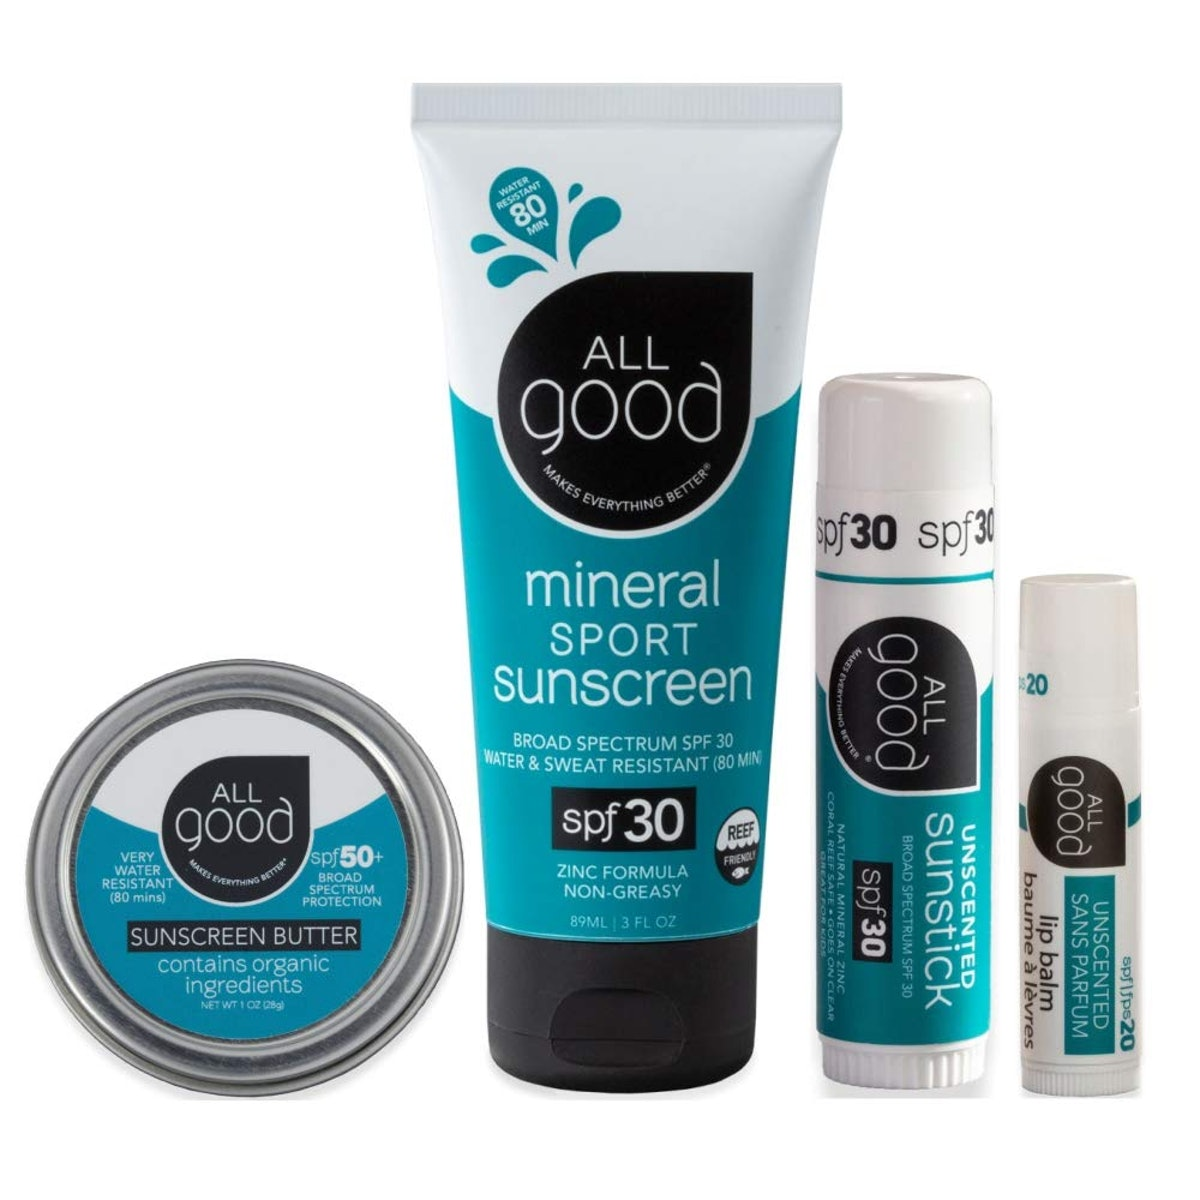 All Good Mineral Sun Care Set